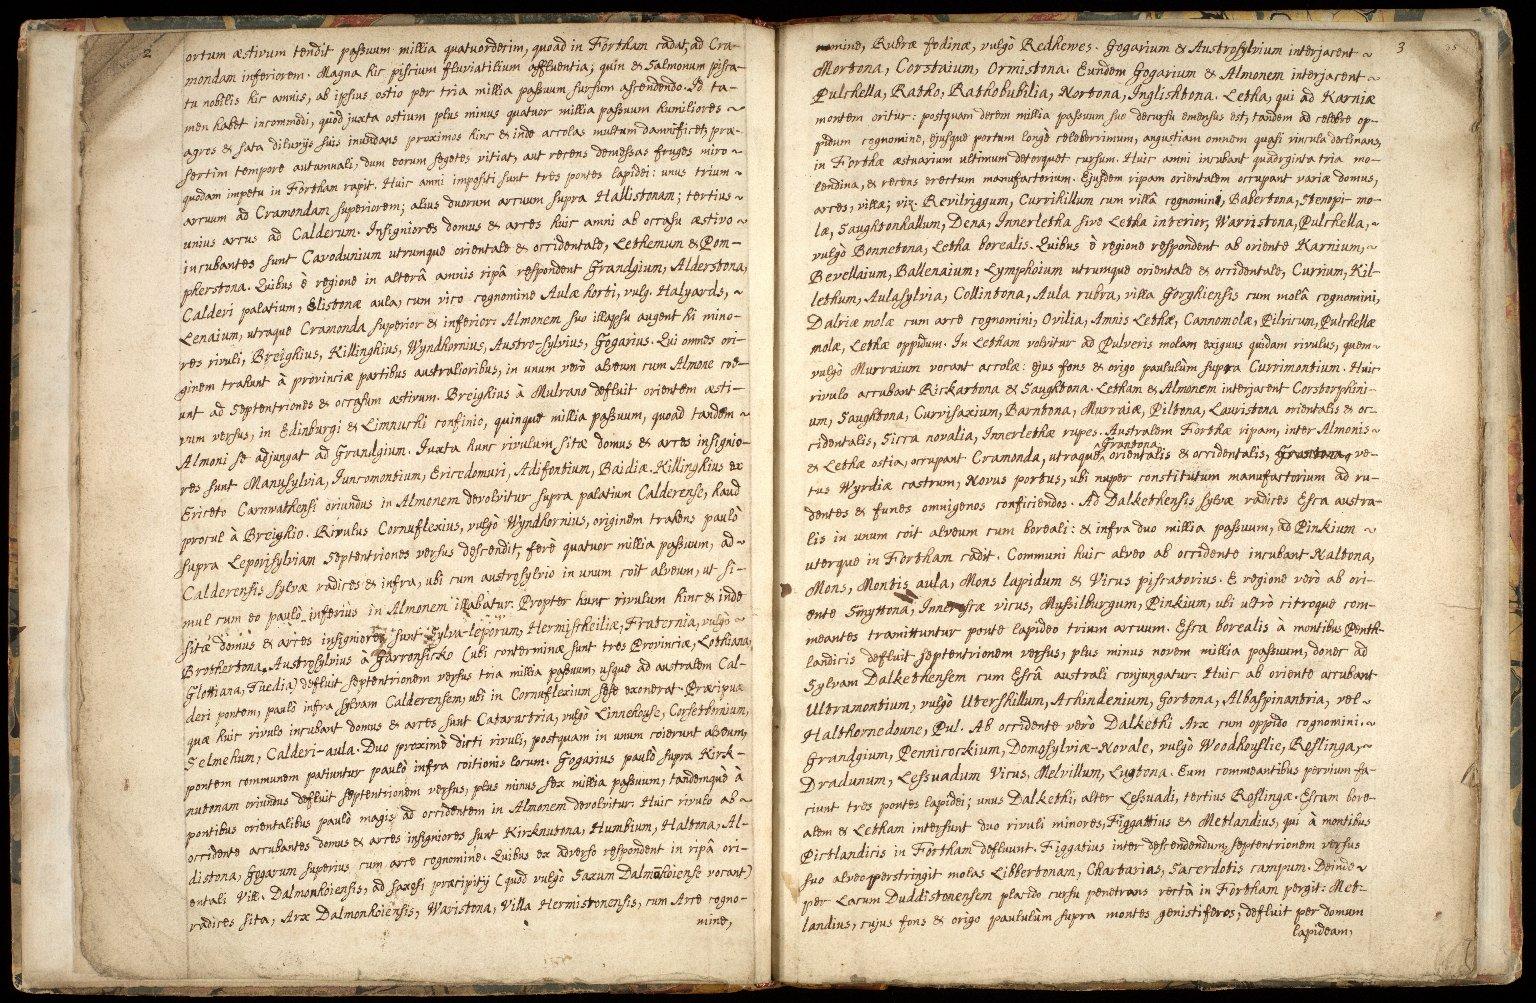 Provincia Edinburgena descriptio. [3 of 7]